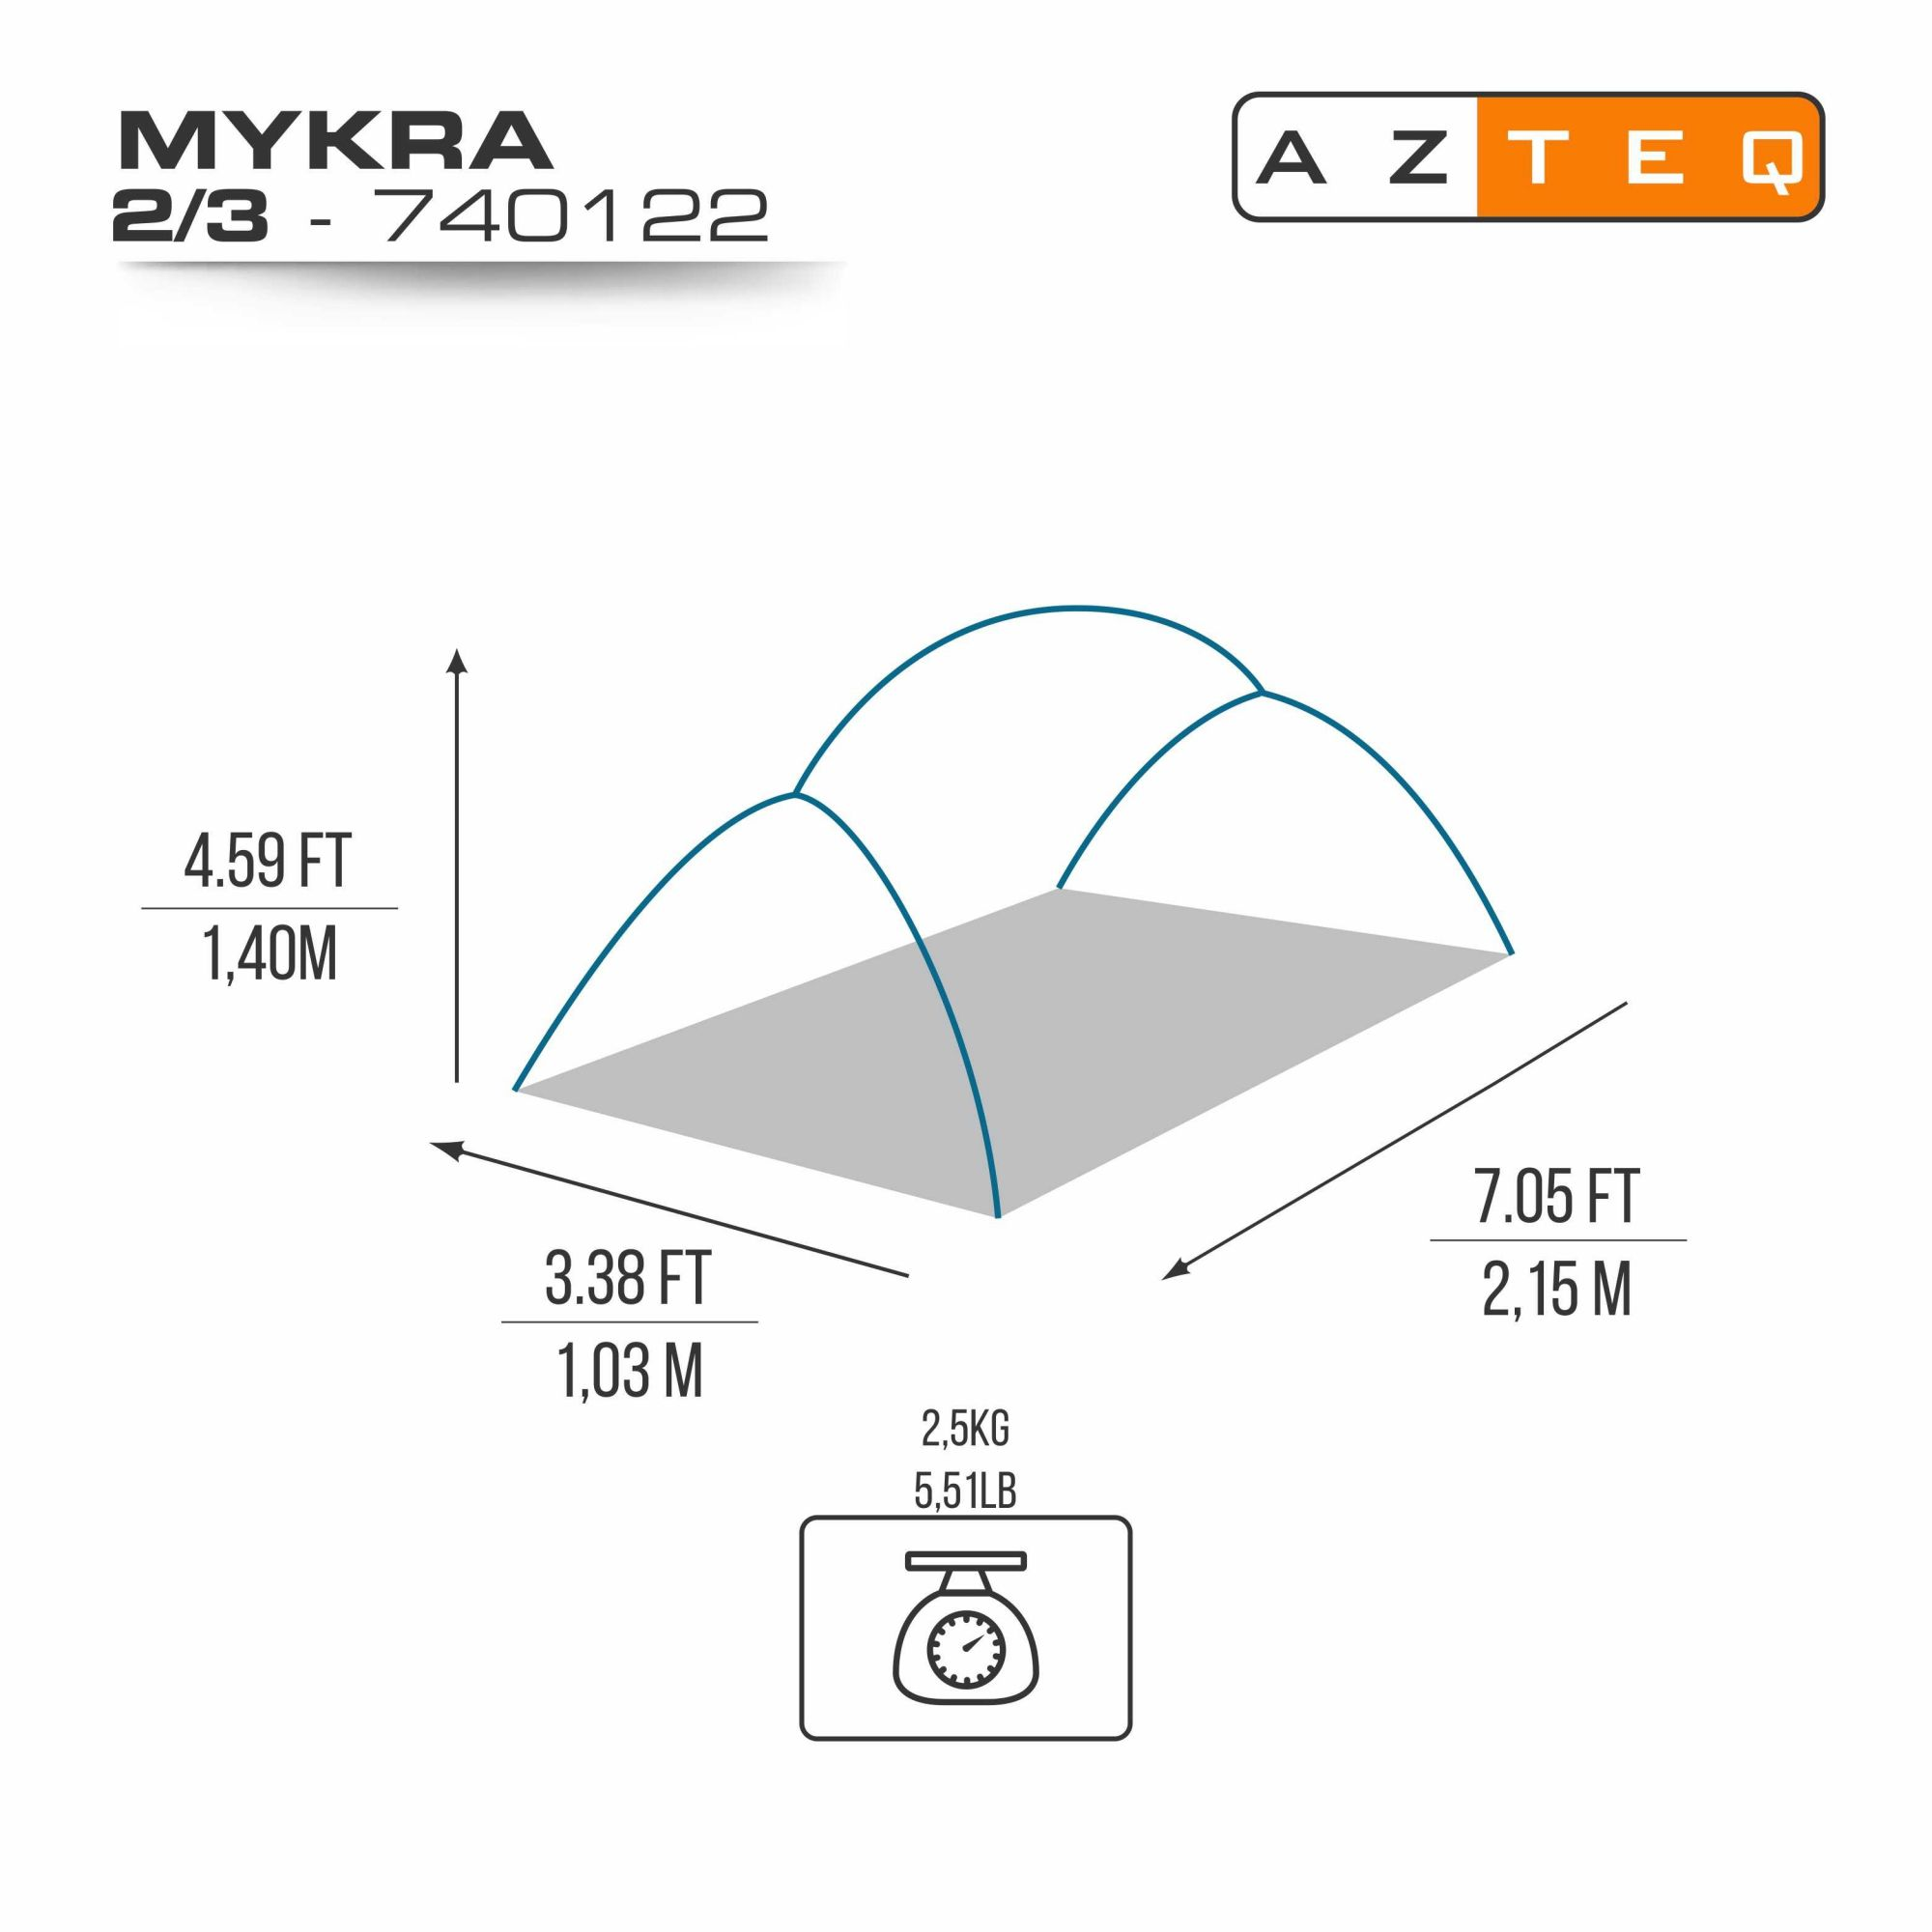 BARRACA MYKRA 2/3 - AZTEQ